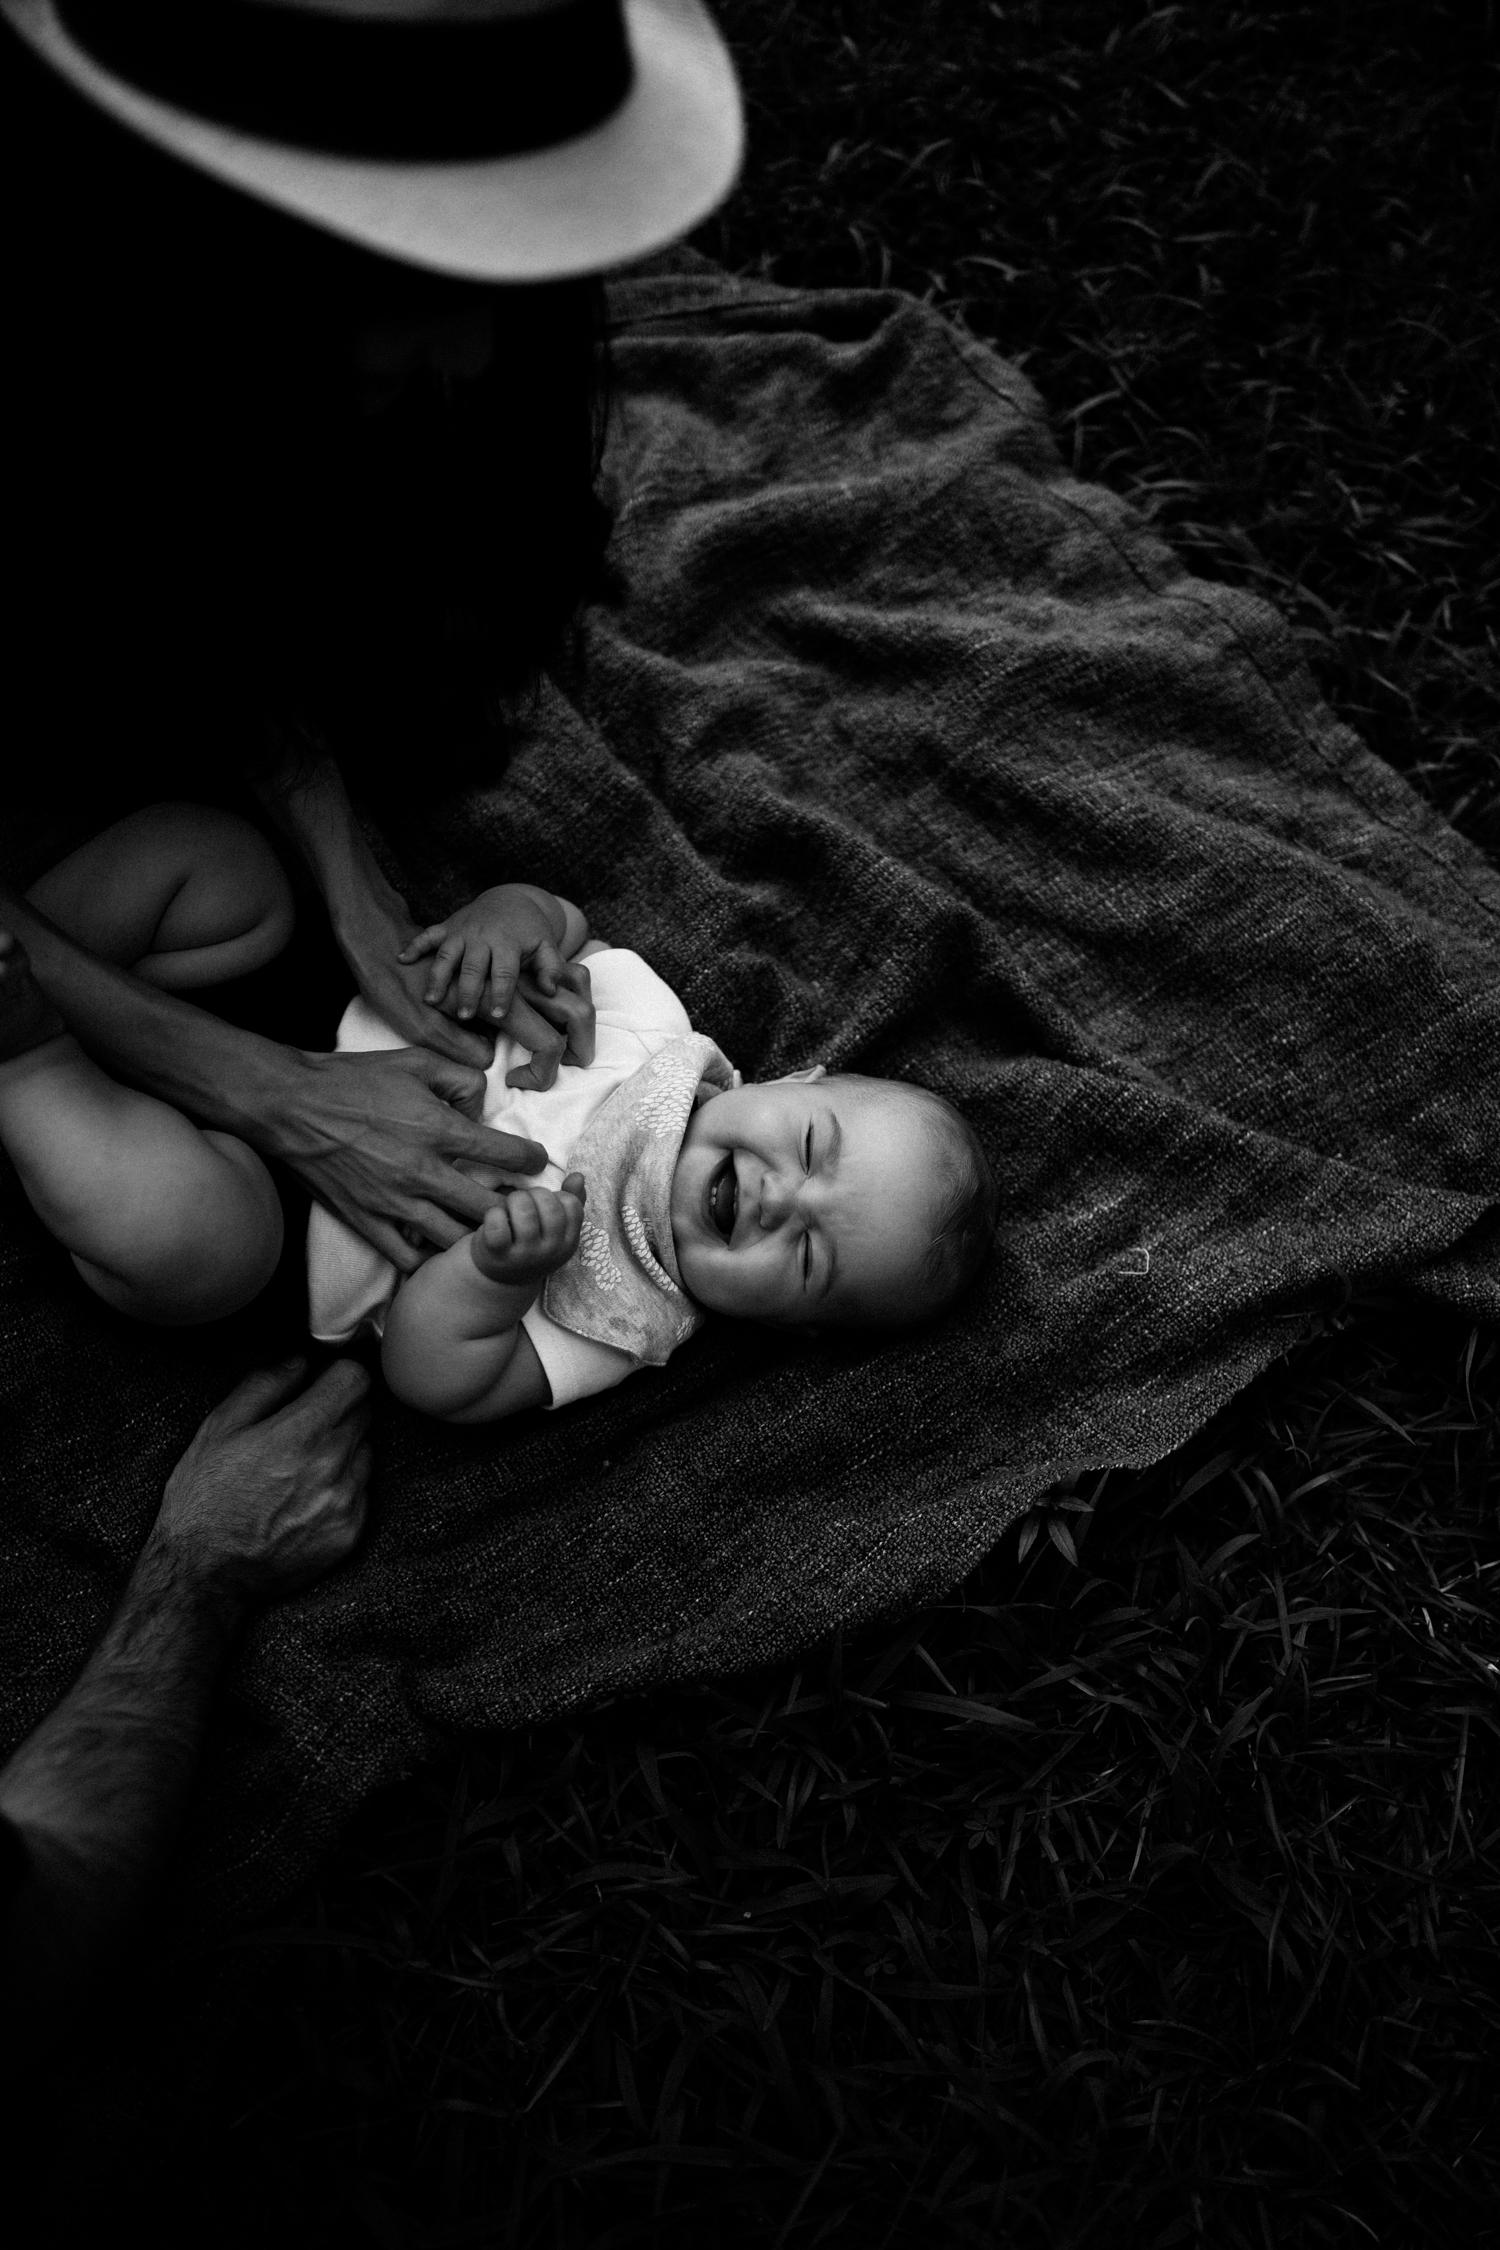 atlanta-nontraditional-family-photographer-6555